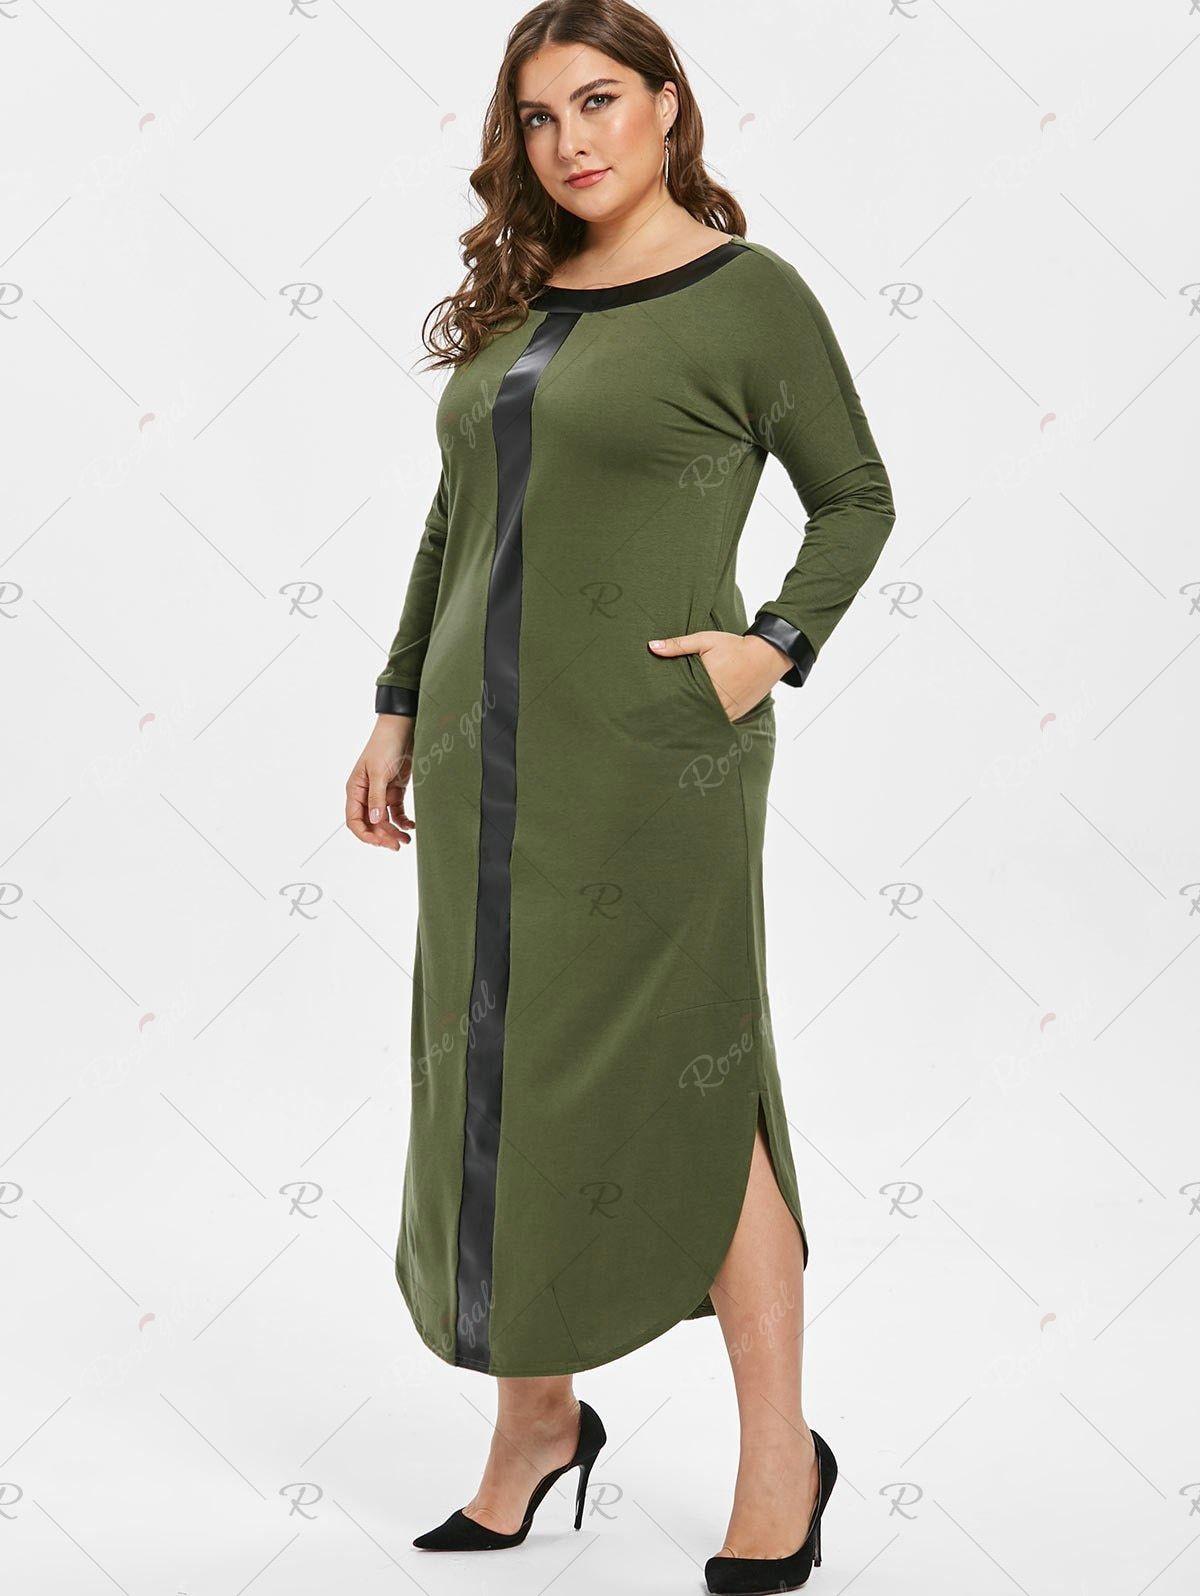 Round Neck Plus Size Two Tone Maxi Dress Maxi Dress Dresses Straight Dress [ 1596 x 1200 Pixel ]